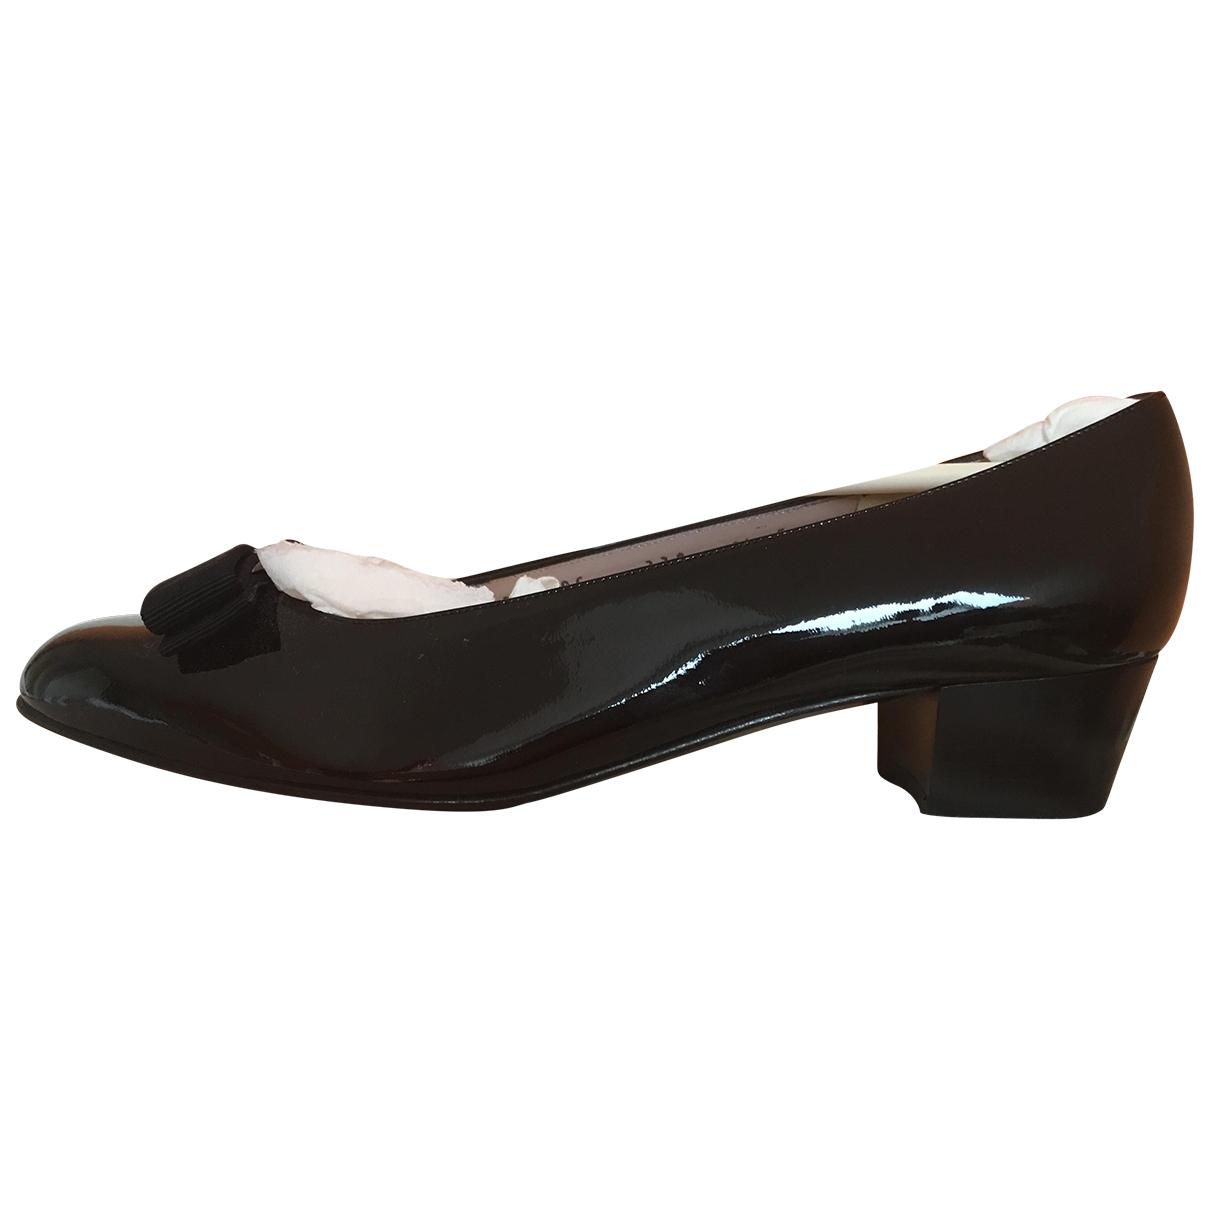 Salvatore Ferragamo Vara Black Patent leather Heels for Women 9.5 US